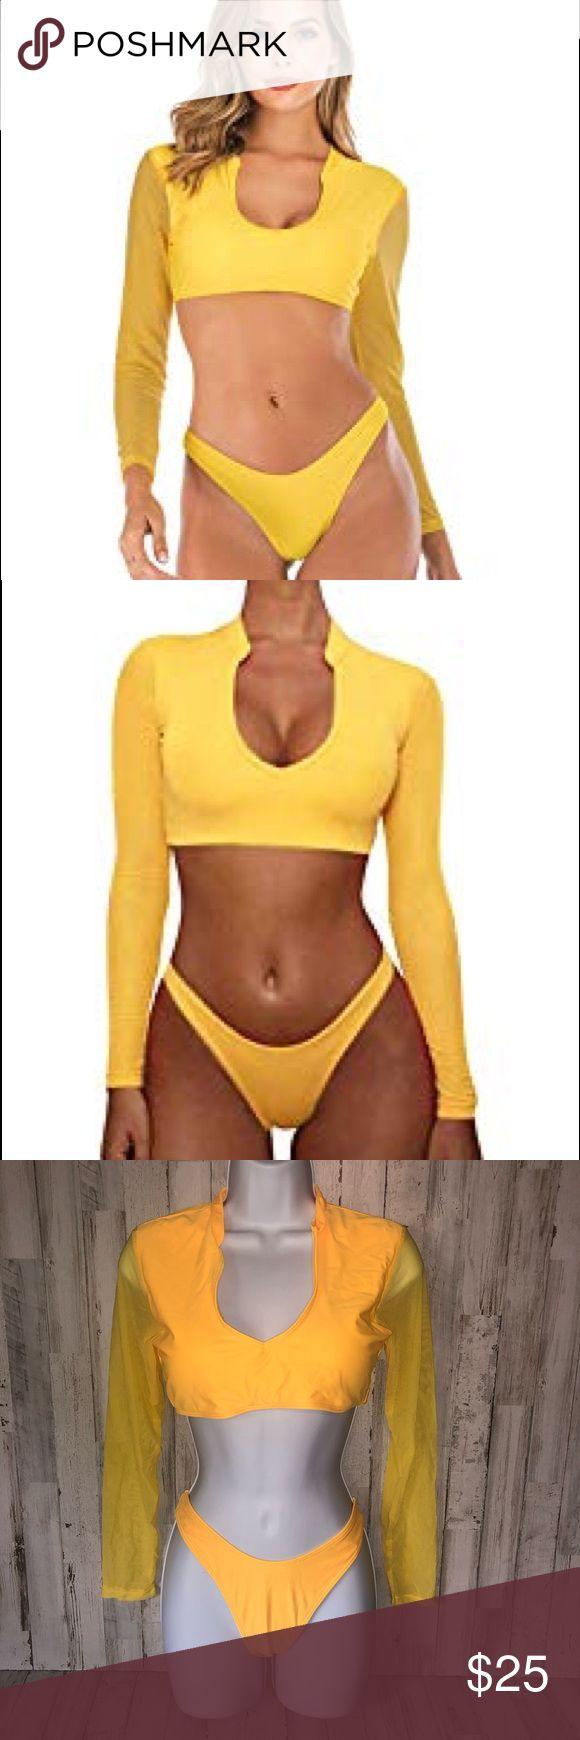 lewis yellow bikini Autumn